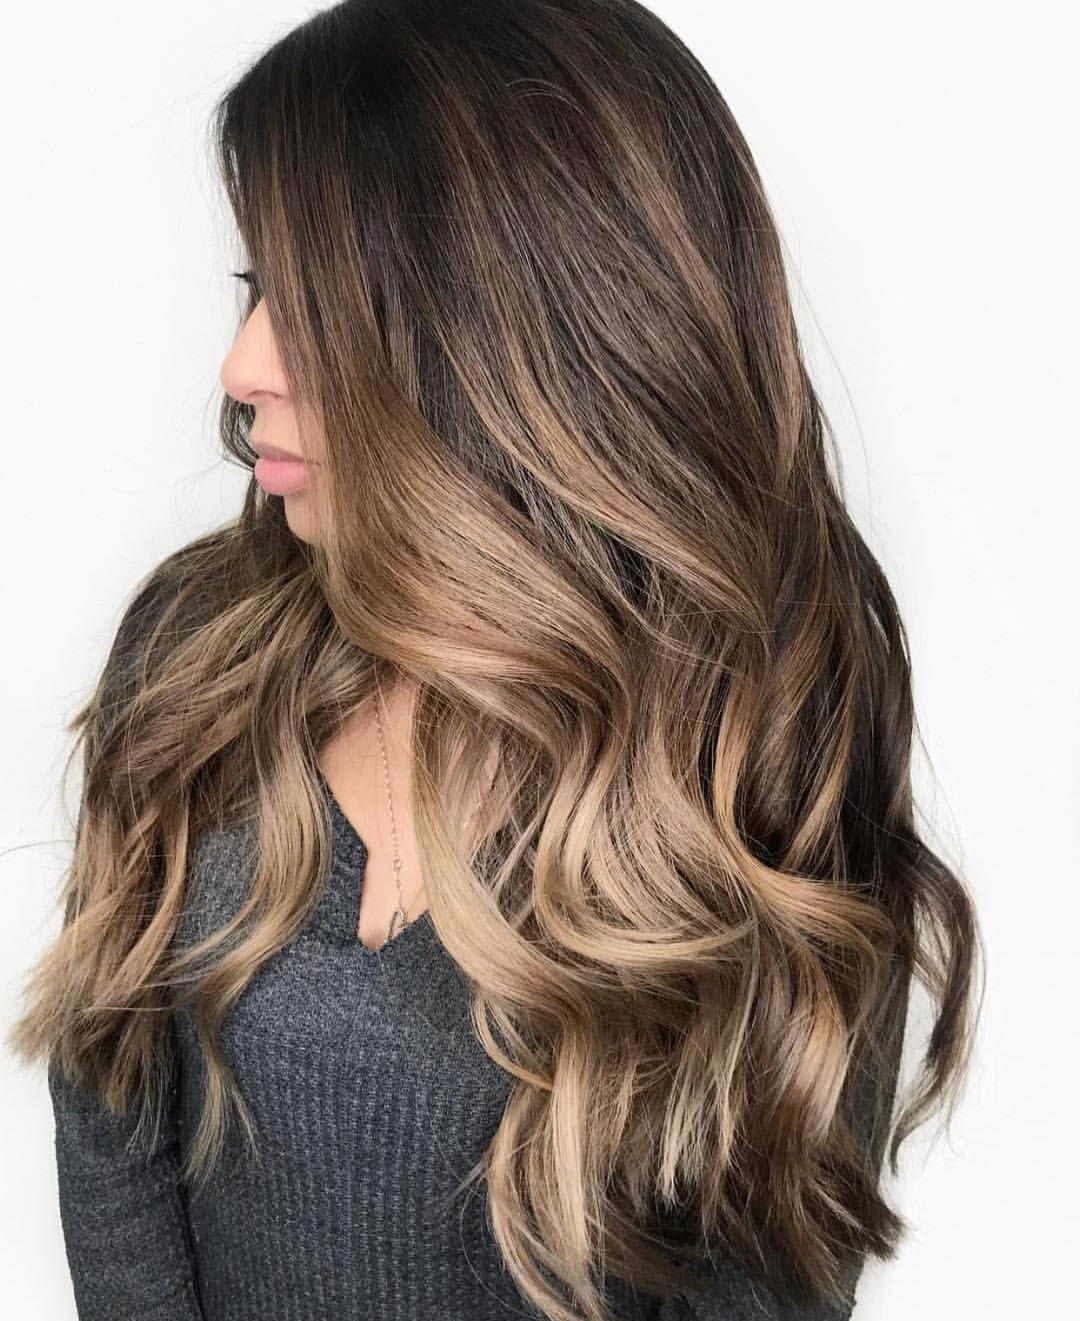 Hair Inspiration 2019-07-04 01:06:10